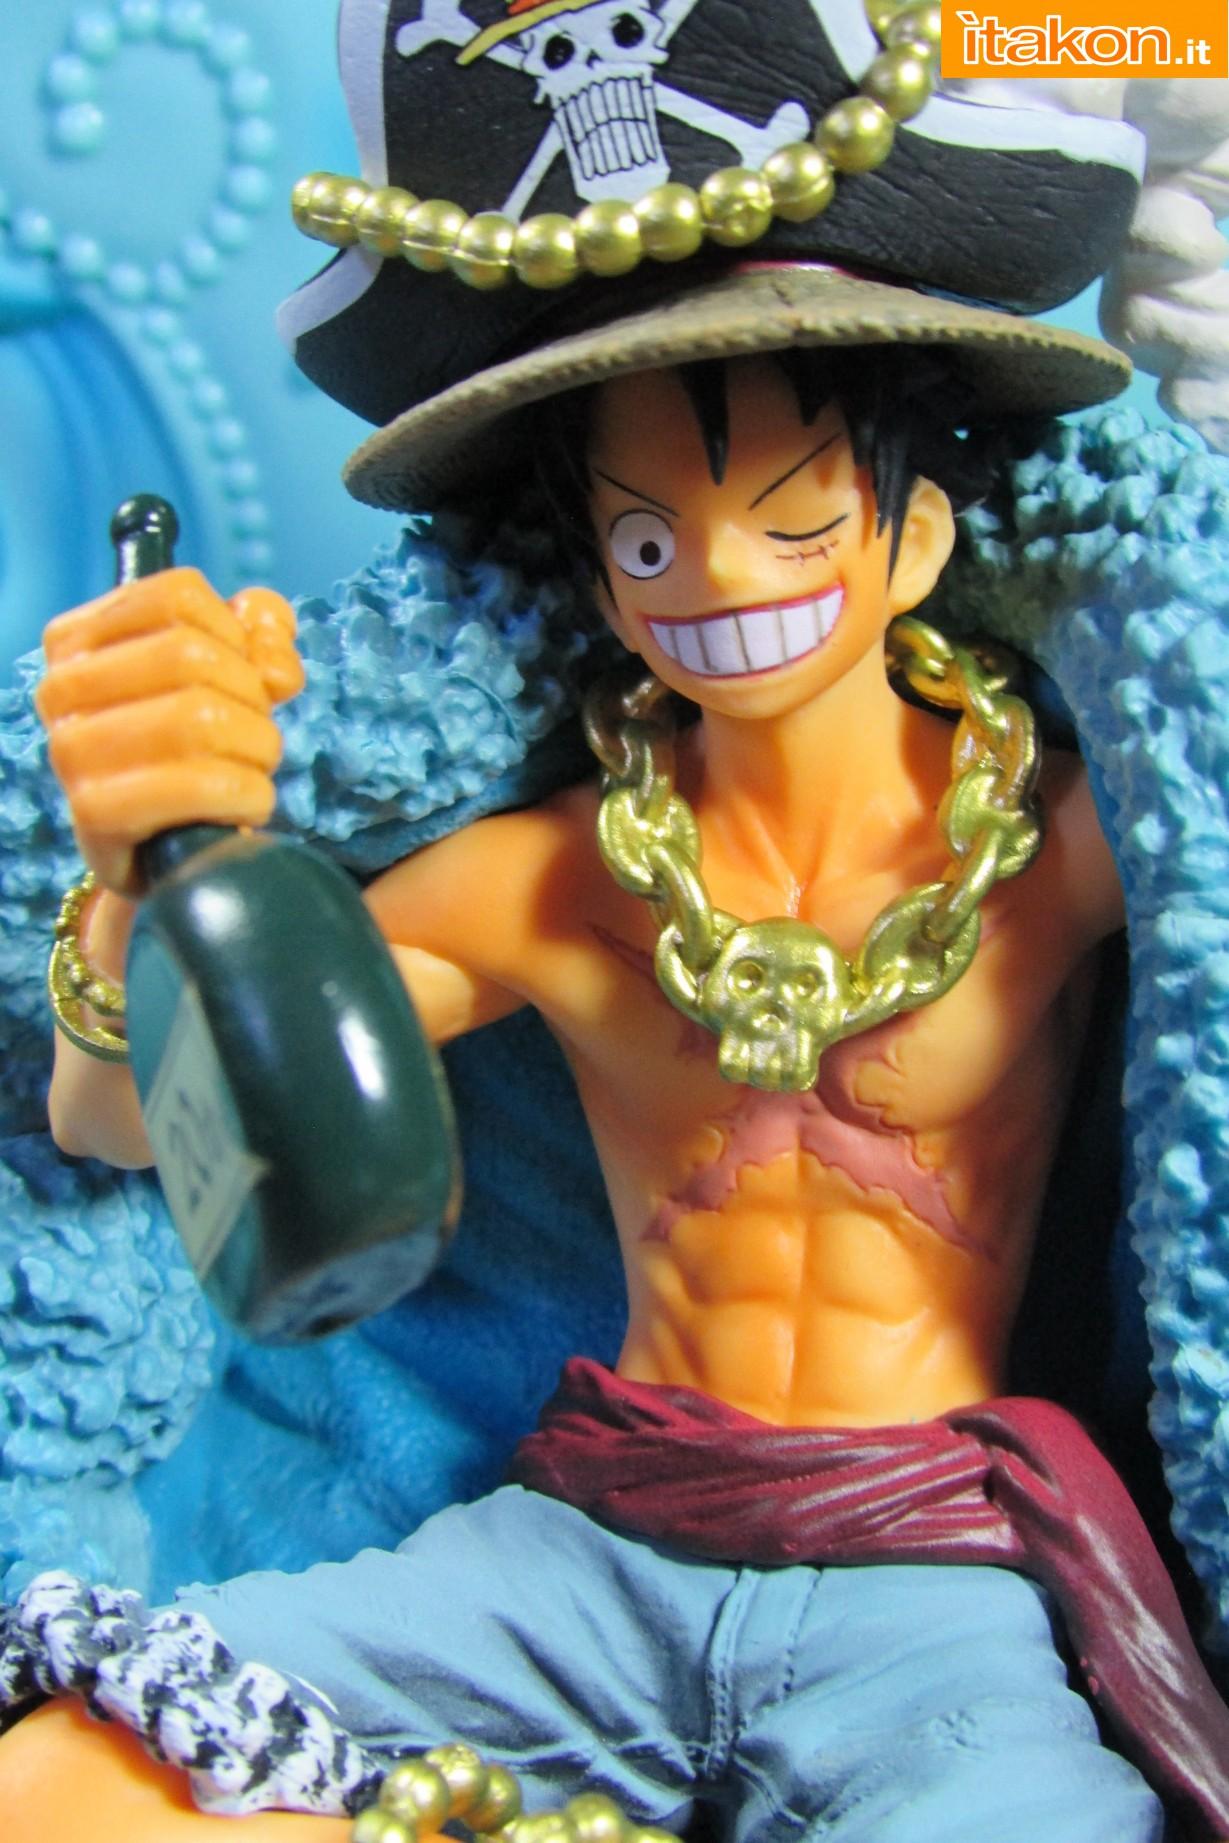 Link a Recensione Review Monkey D. Luffy One Piece 20th Anniversary ver. Figuarts ZERO di Bandai 31